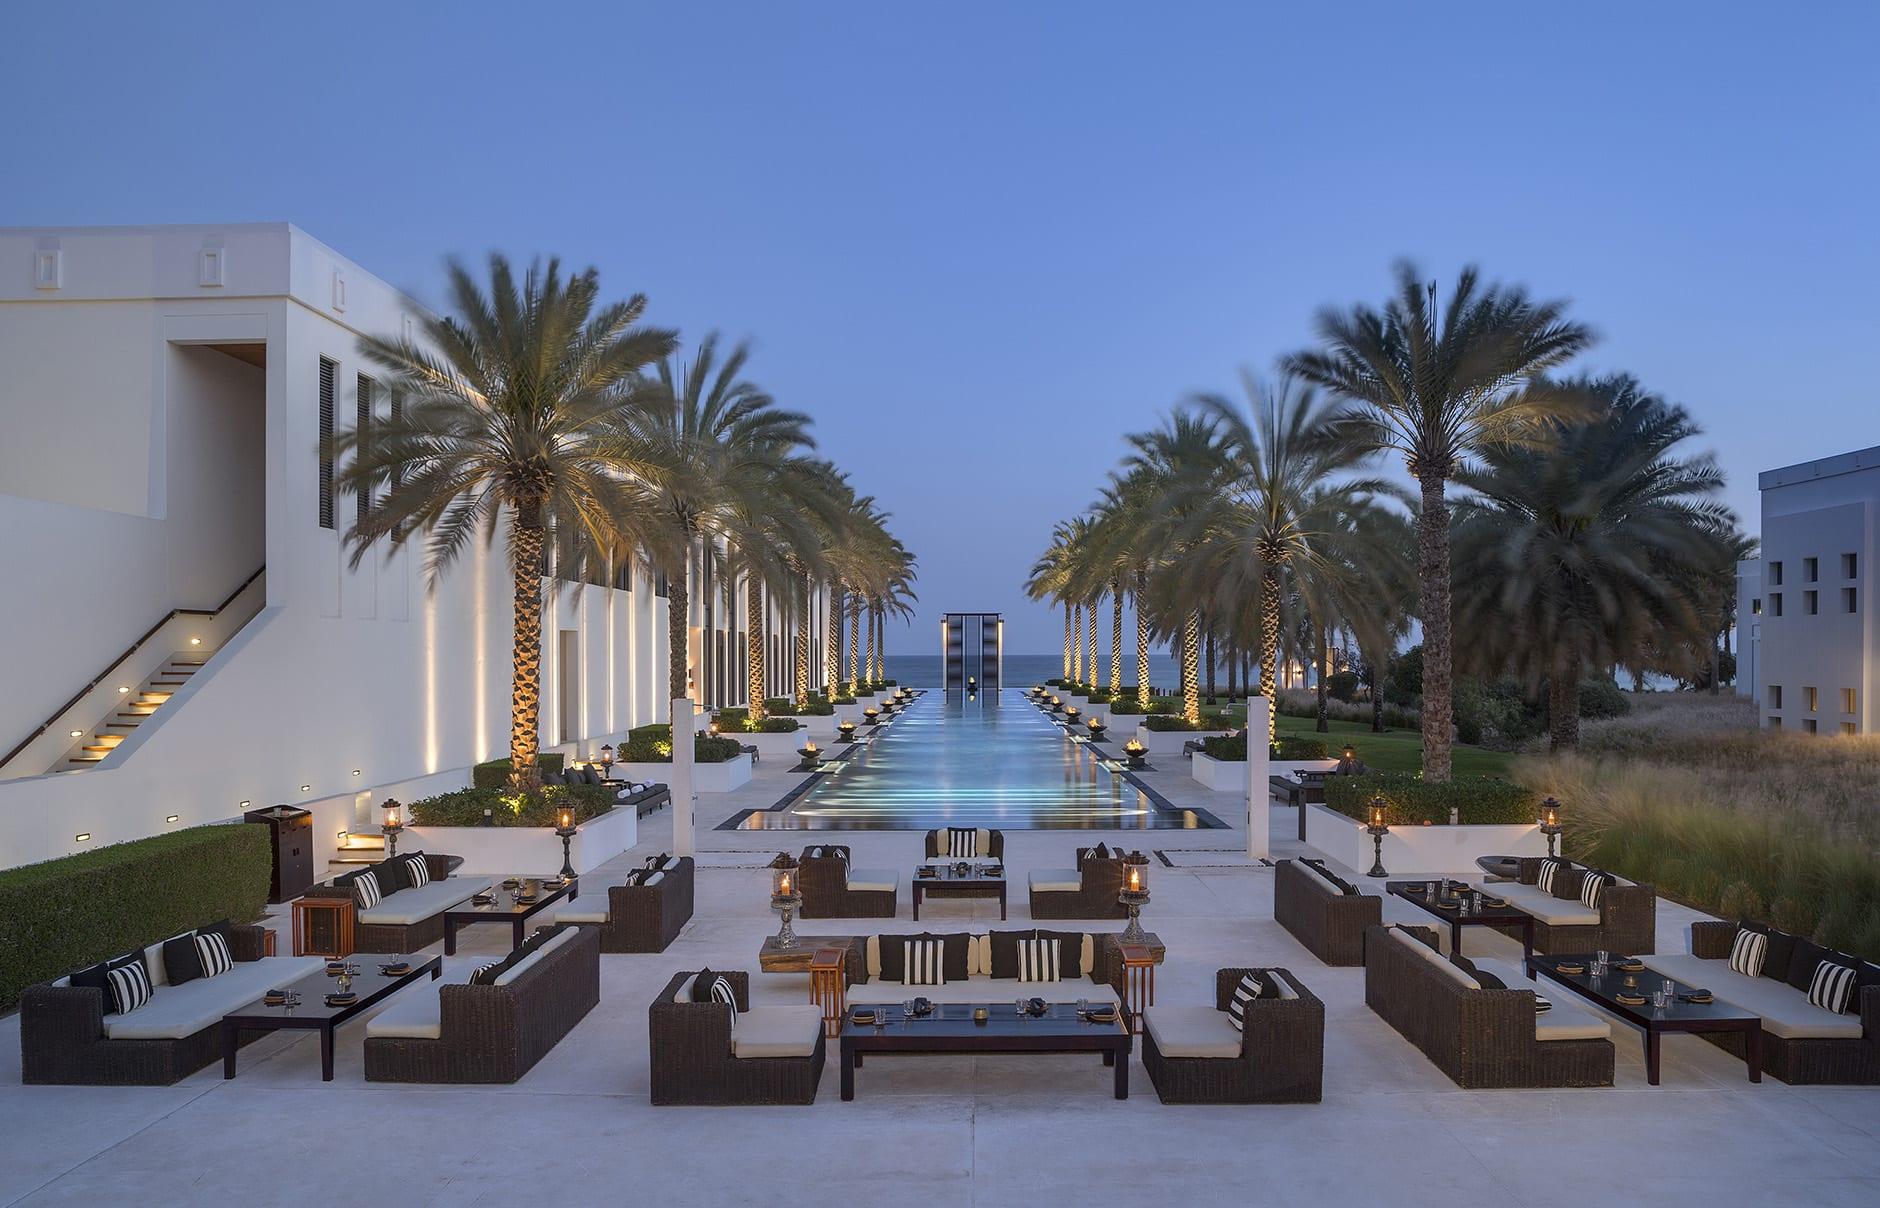 Chedi Muscat, Oman. © GHM Hotels